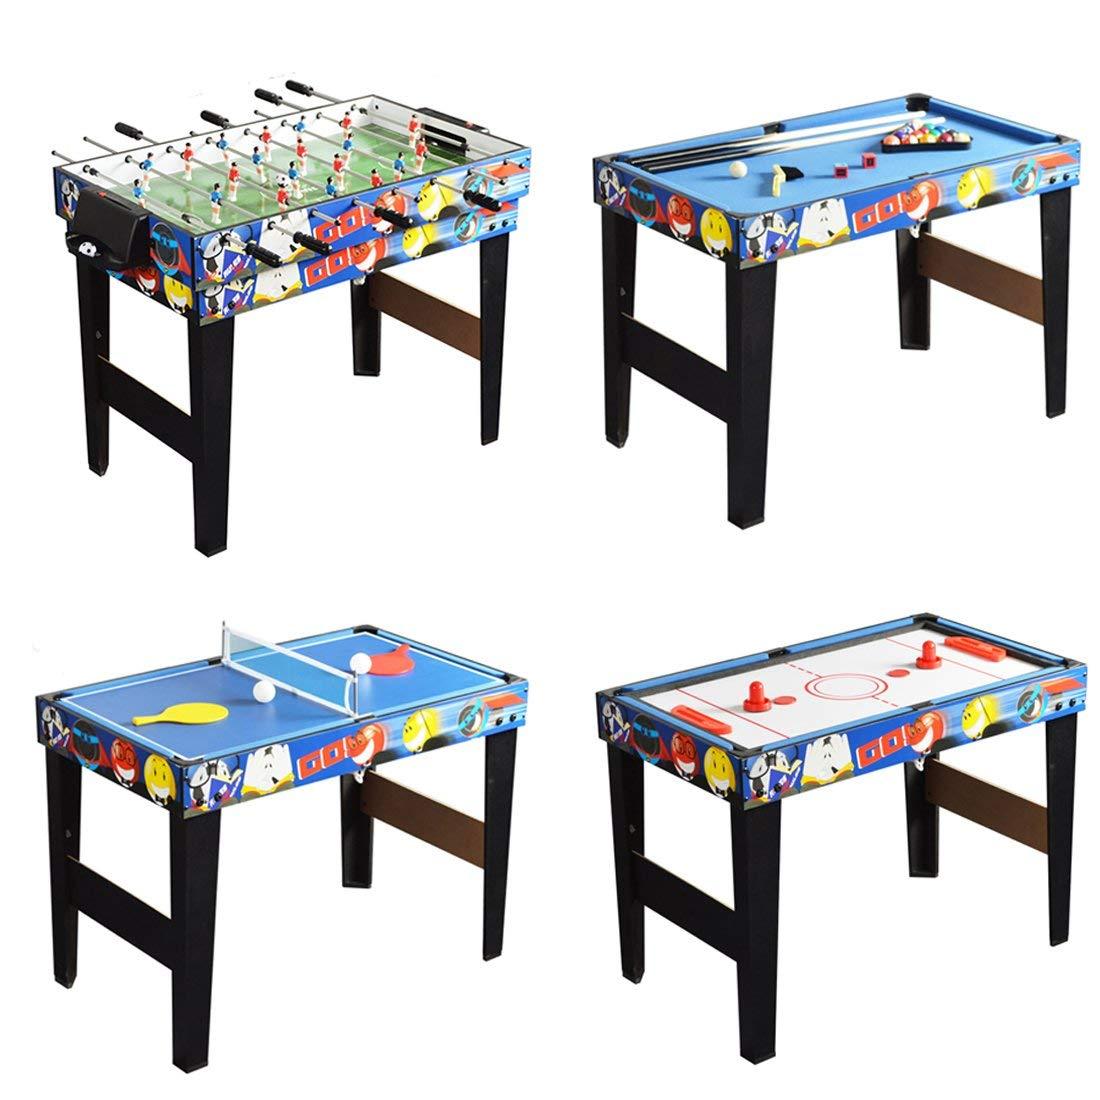 QYBK Deluxe 4 in 1 Top Game Table -Table Tennis,Glide Hockey,Foosball,Pool,Basketball Set by QYBK